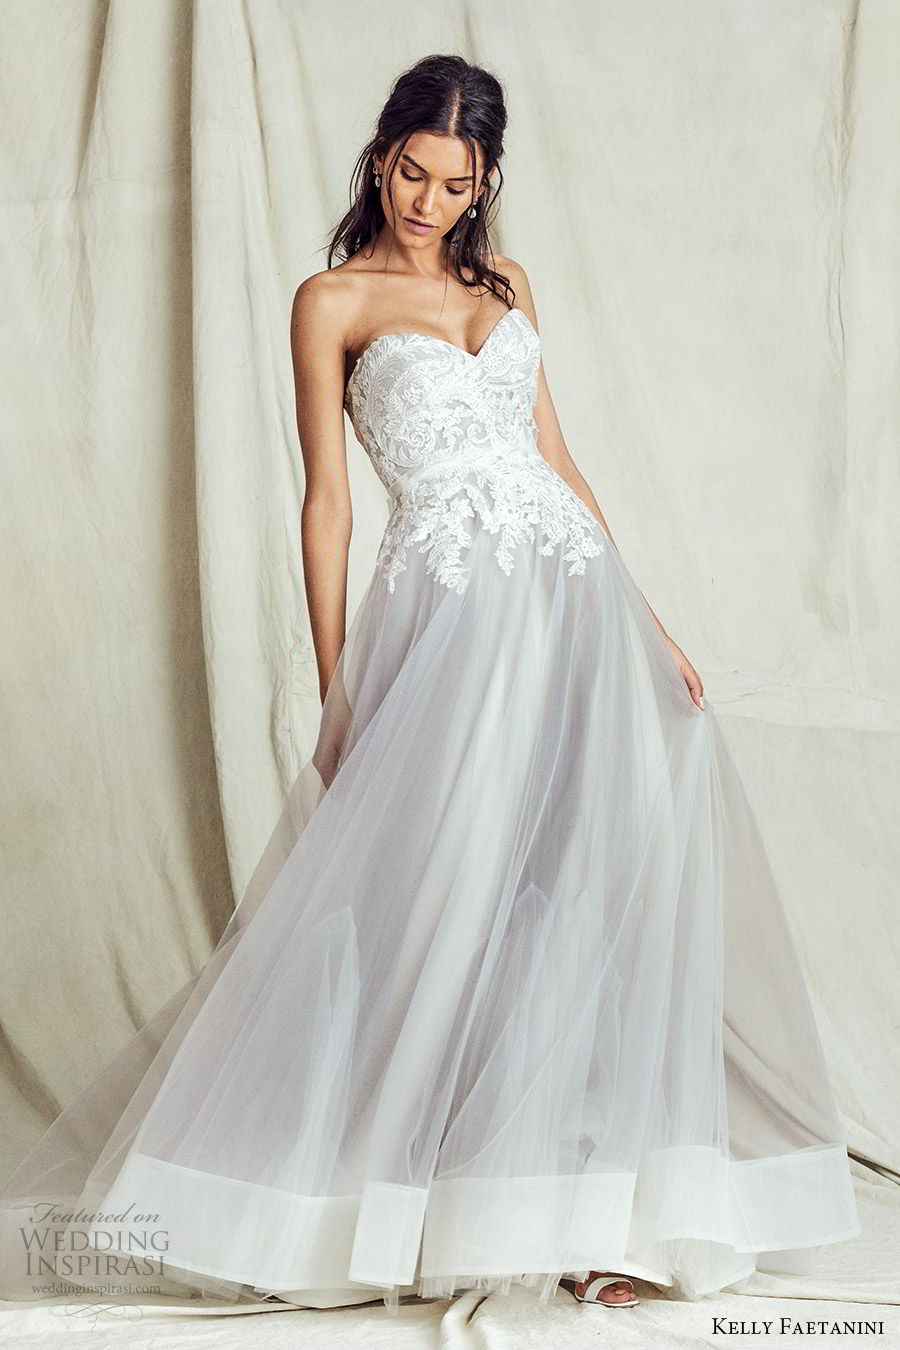 kelly faetanini fall 2019 bridal strapless sweetheart lace bodice a line ball gown wedding dress chapel train romantic elegant grey color (10) mv